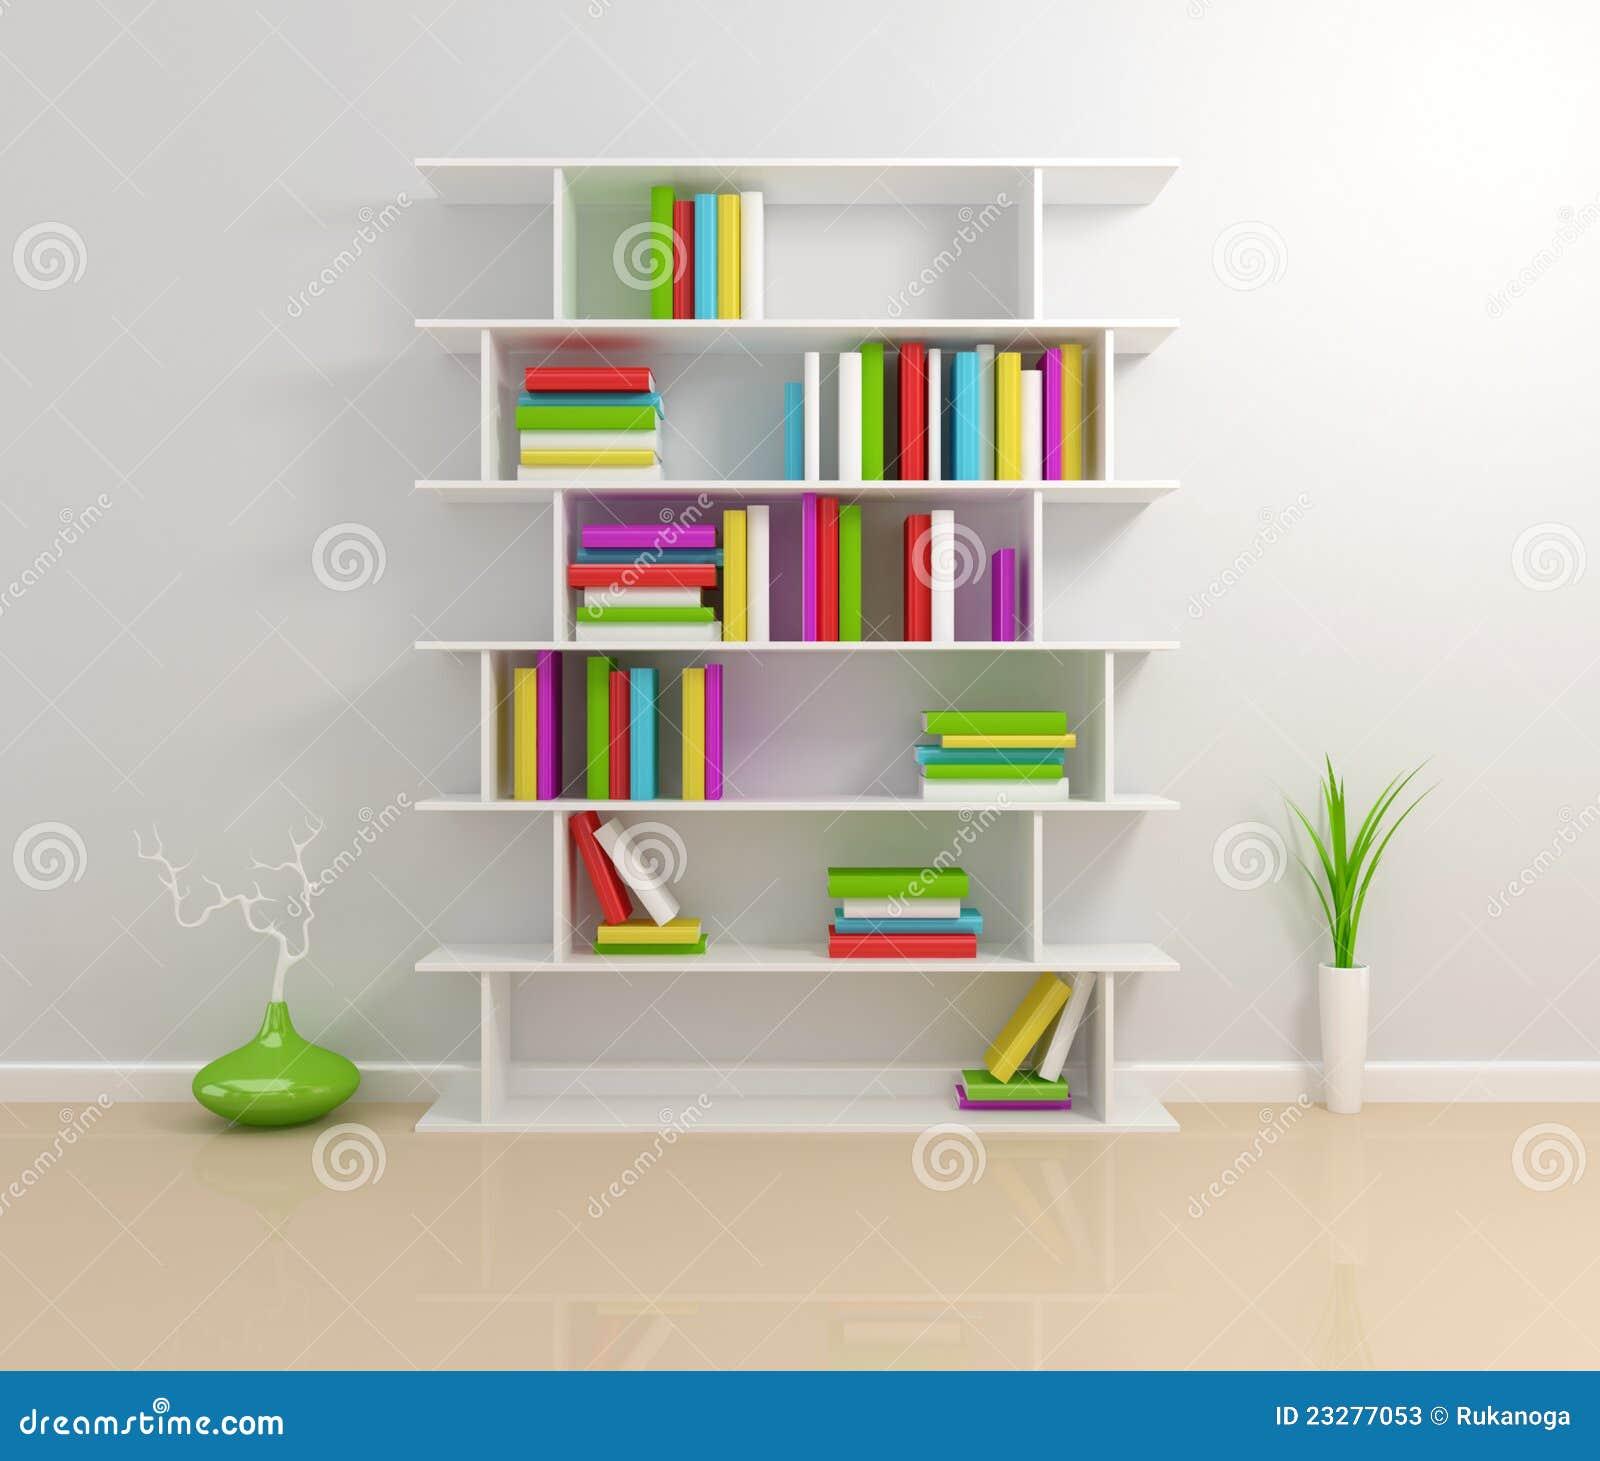 White bookshelf with a